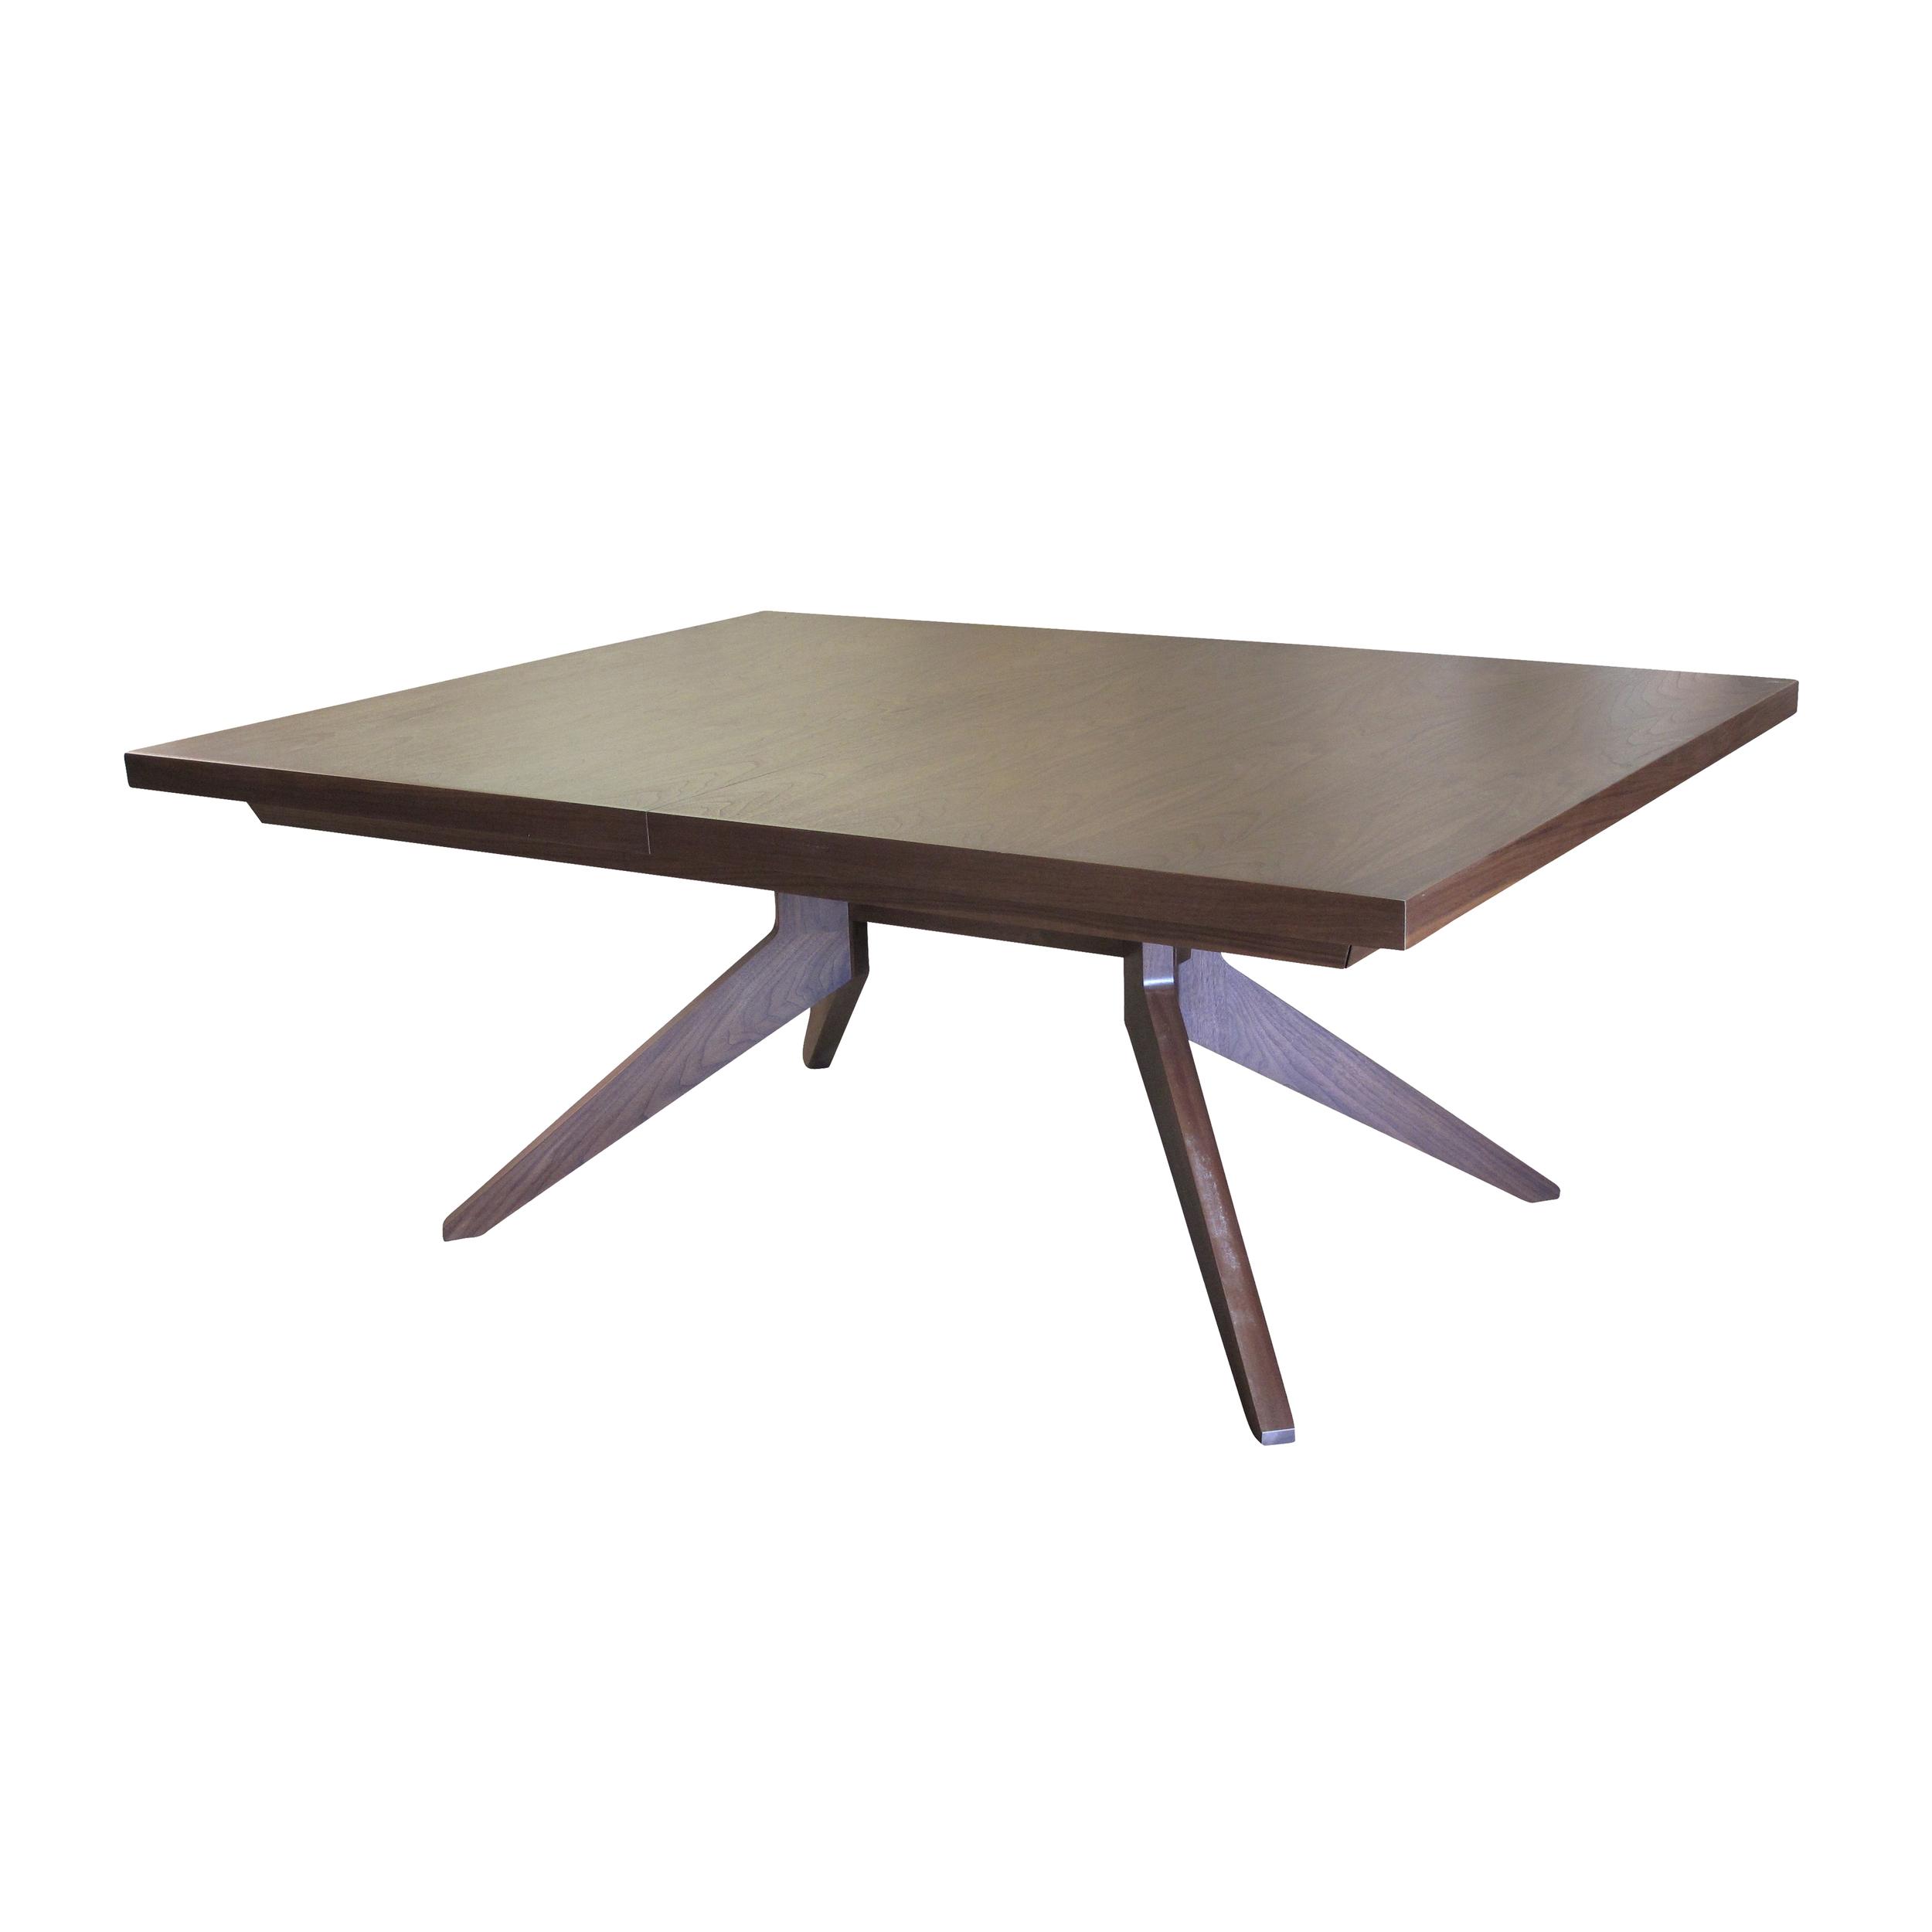 SARATOGA Dining Table